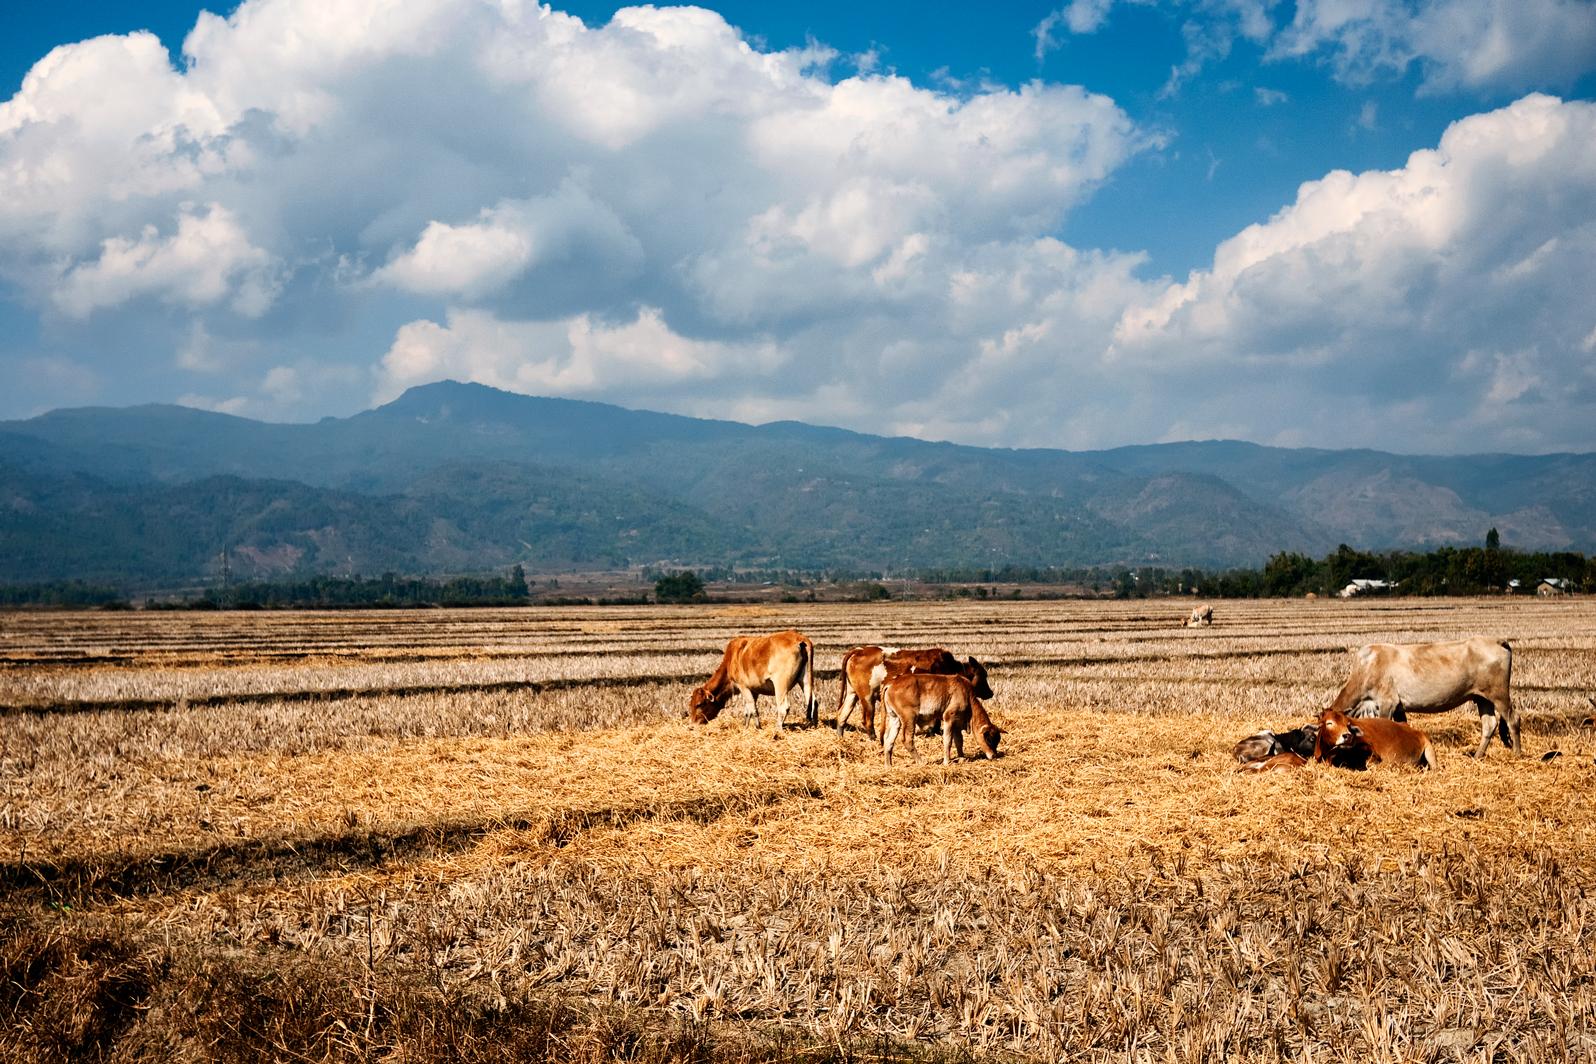 The Battlefield of Potsangbam